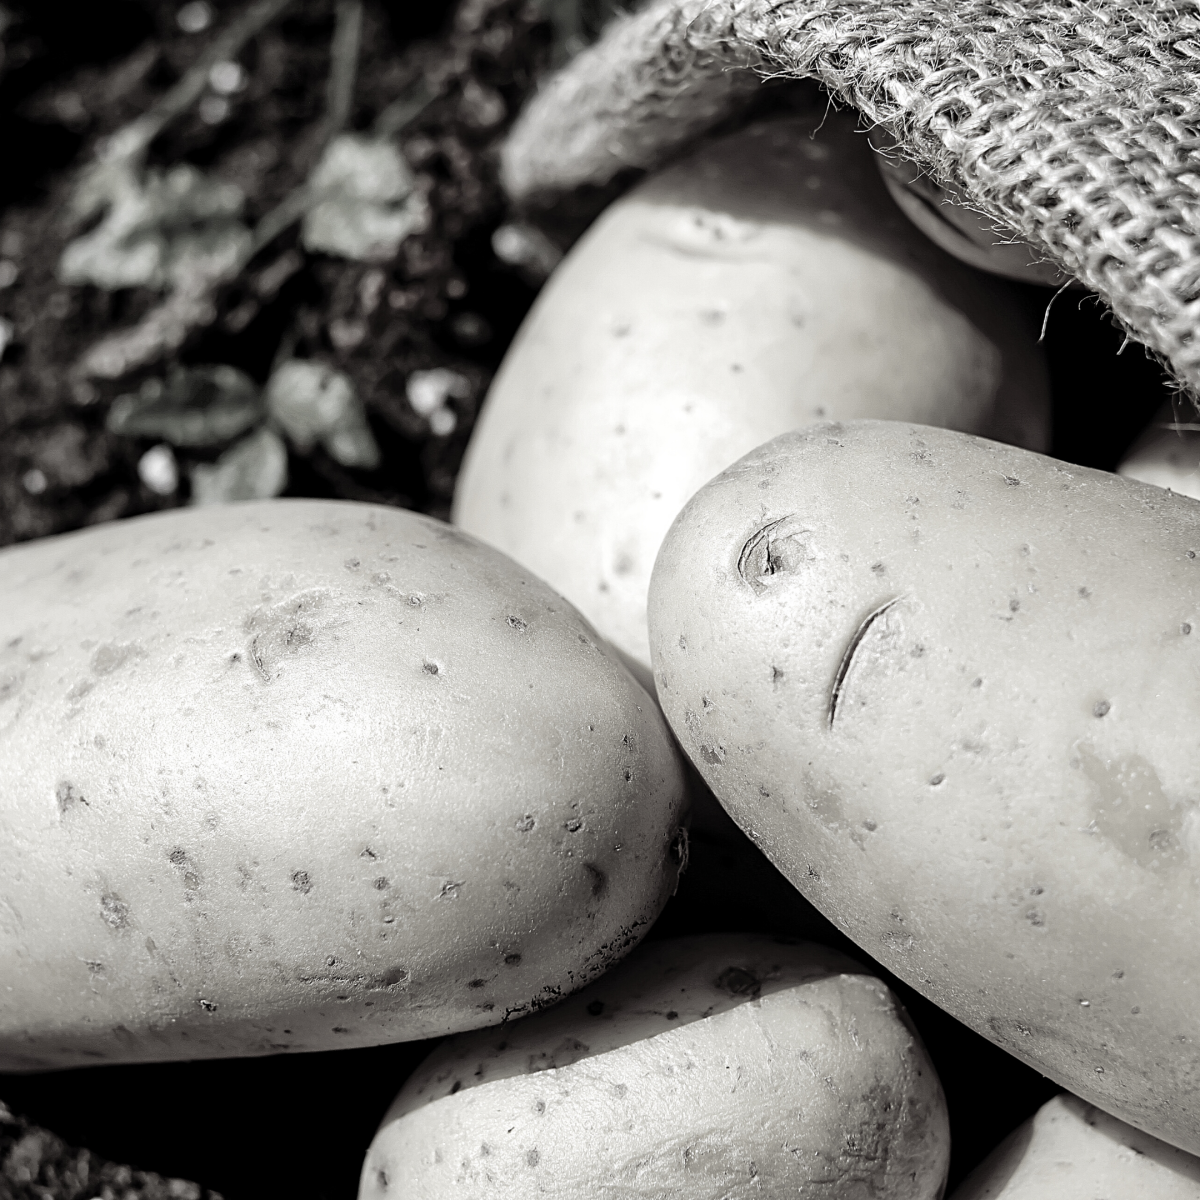 potato-an-acrostic-poem